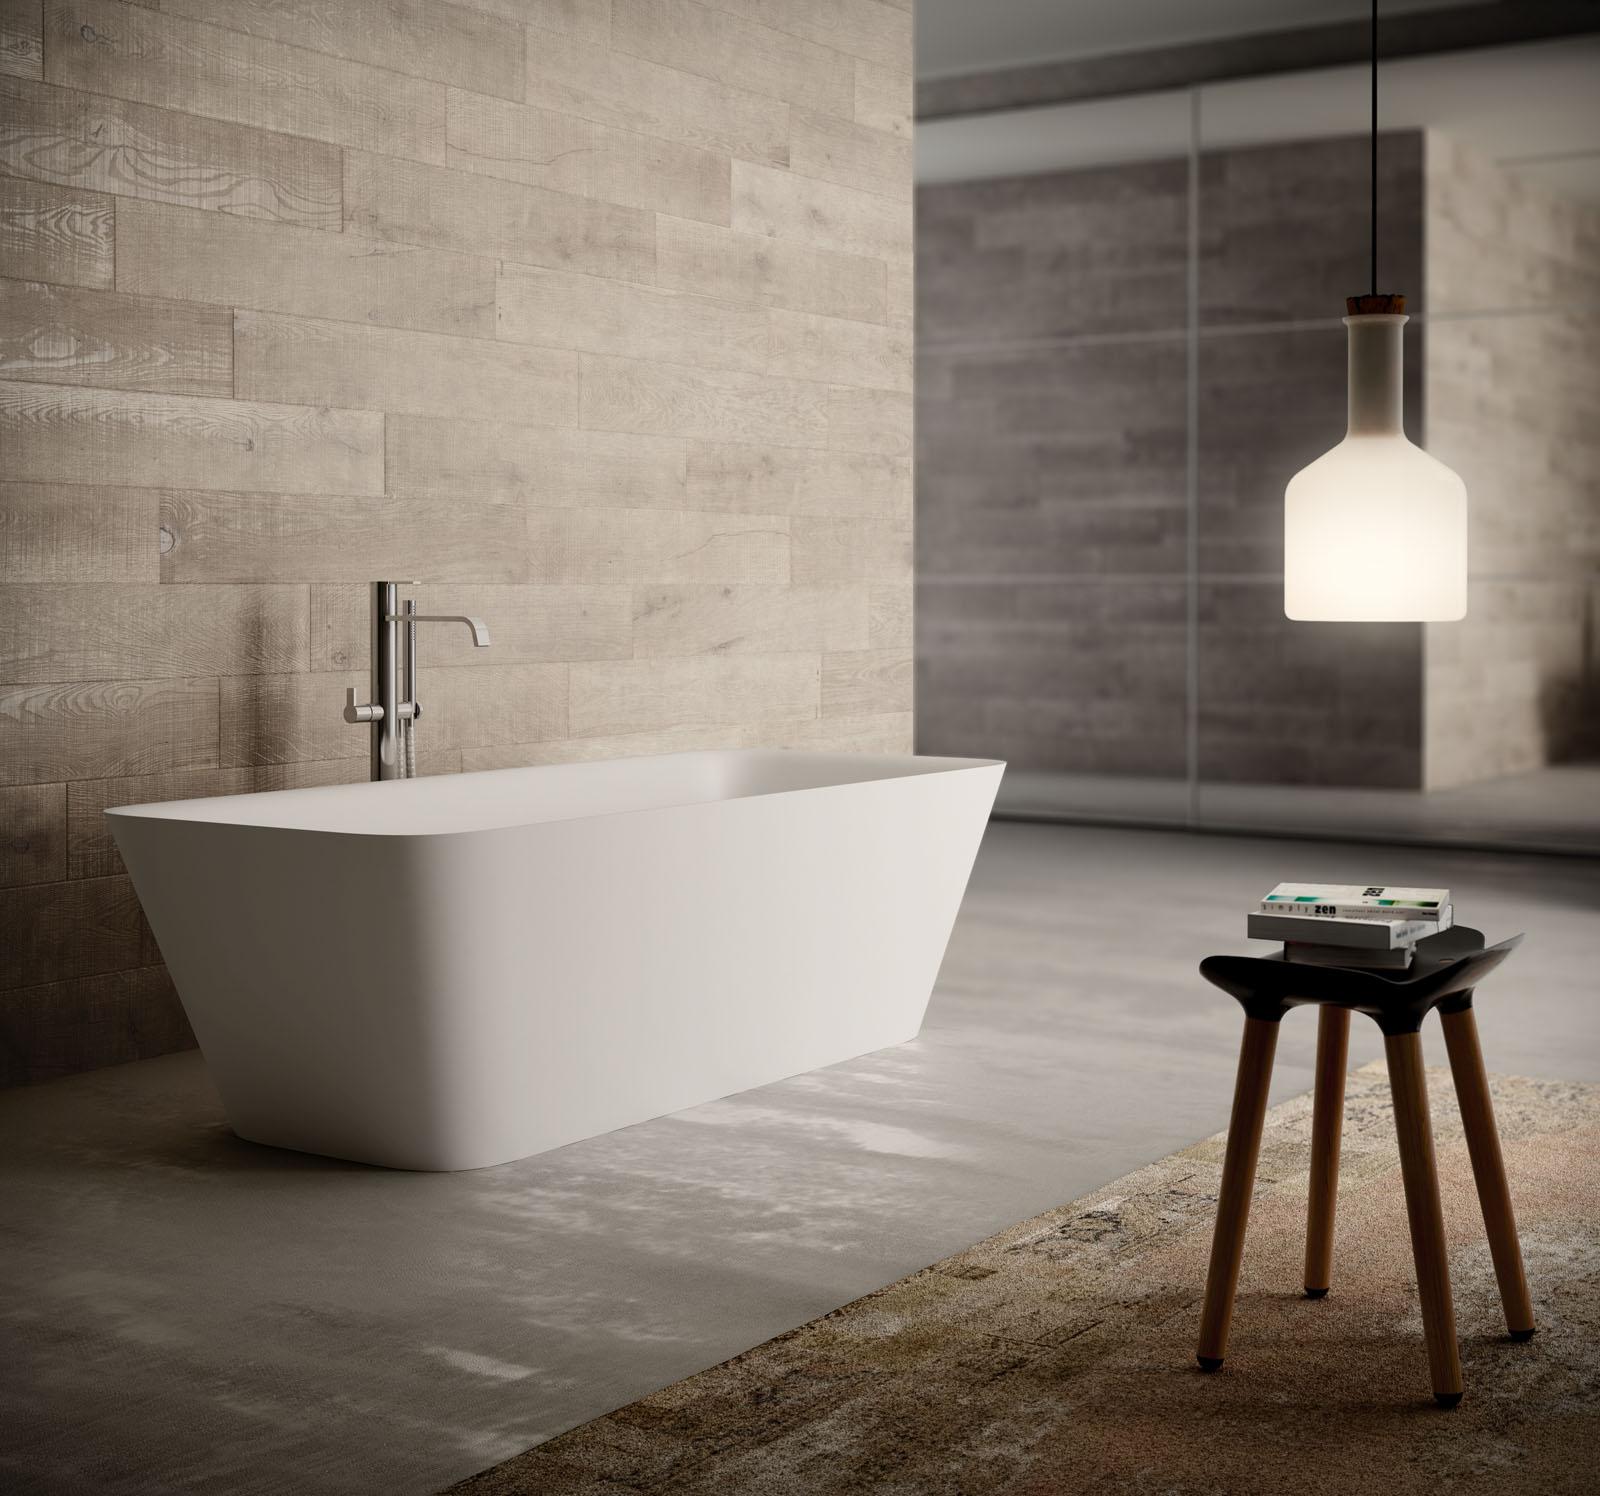 Equal vasca da bagno rettangolare disenia - Vasca da bagno rettangolare ...